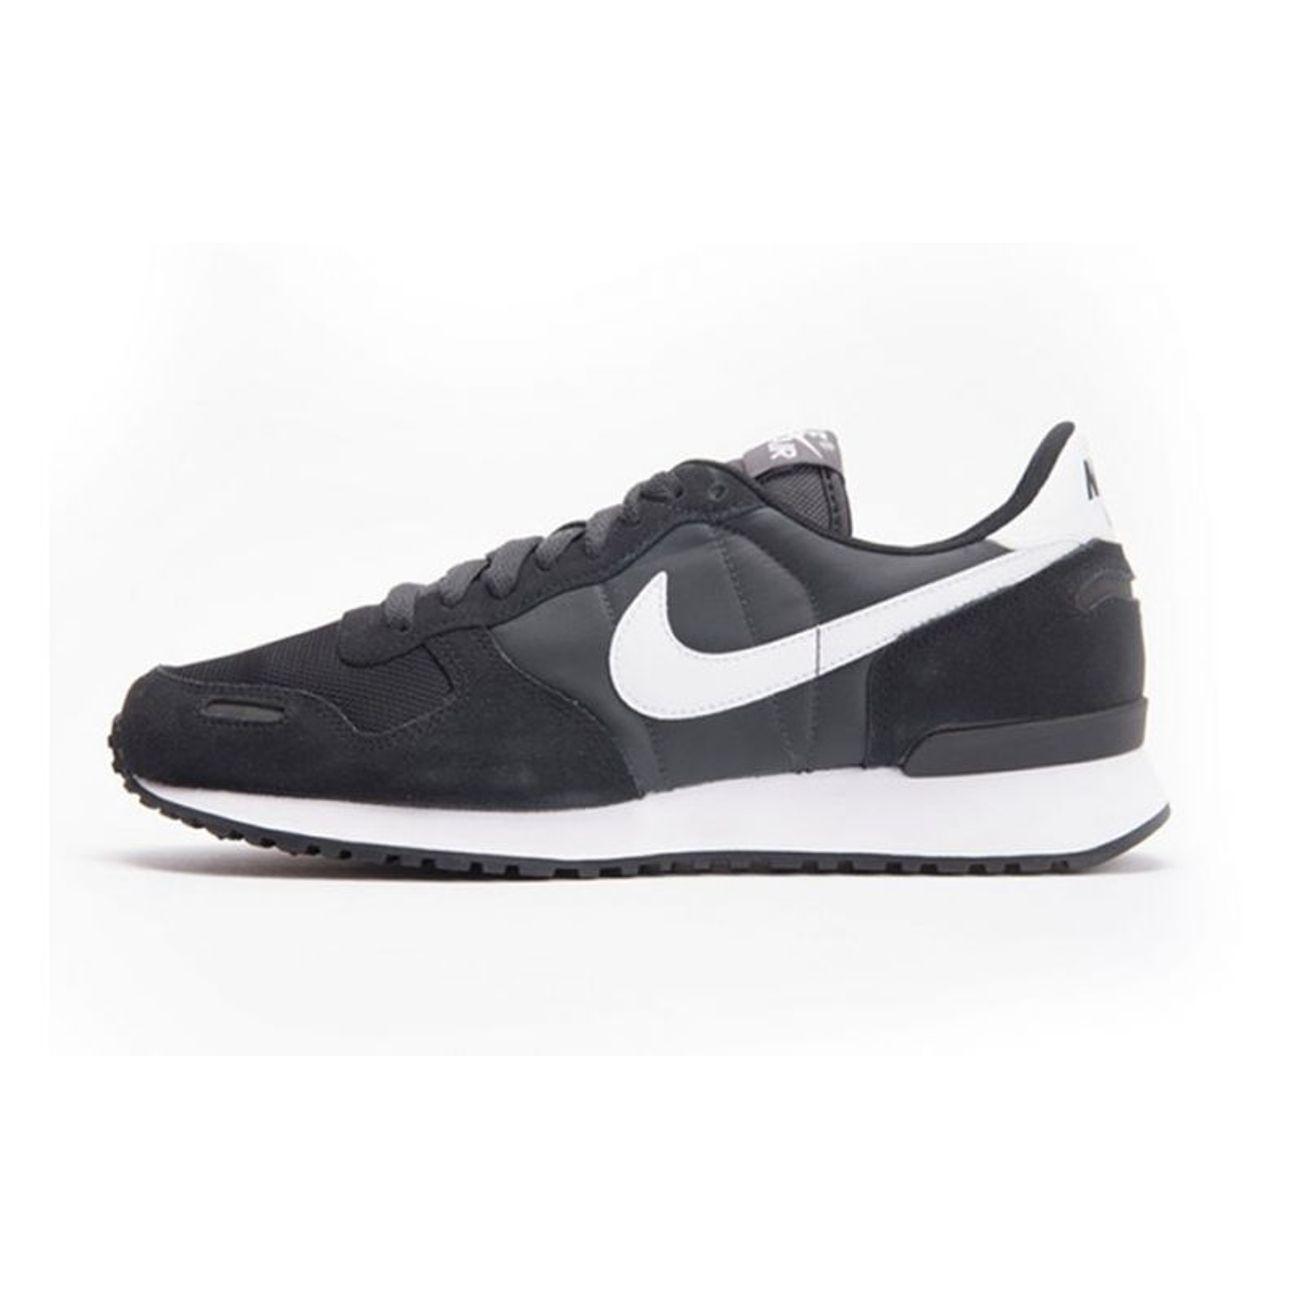 Vertex Air Nike 010 Padel Adulte Ni903896 Noir 5R3L4Aj